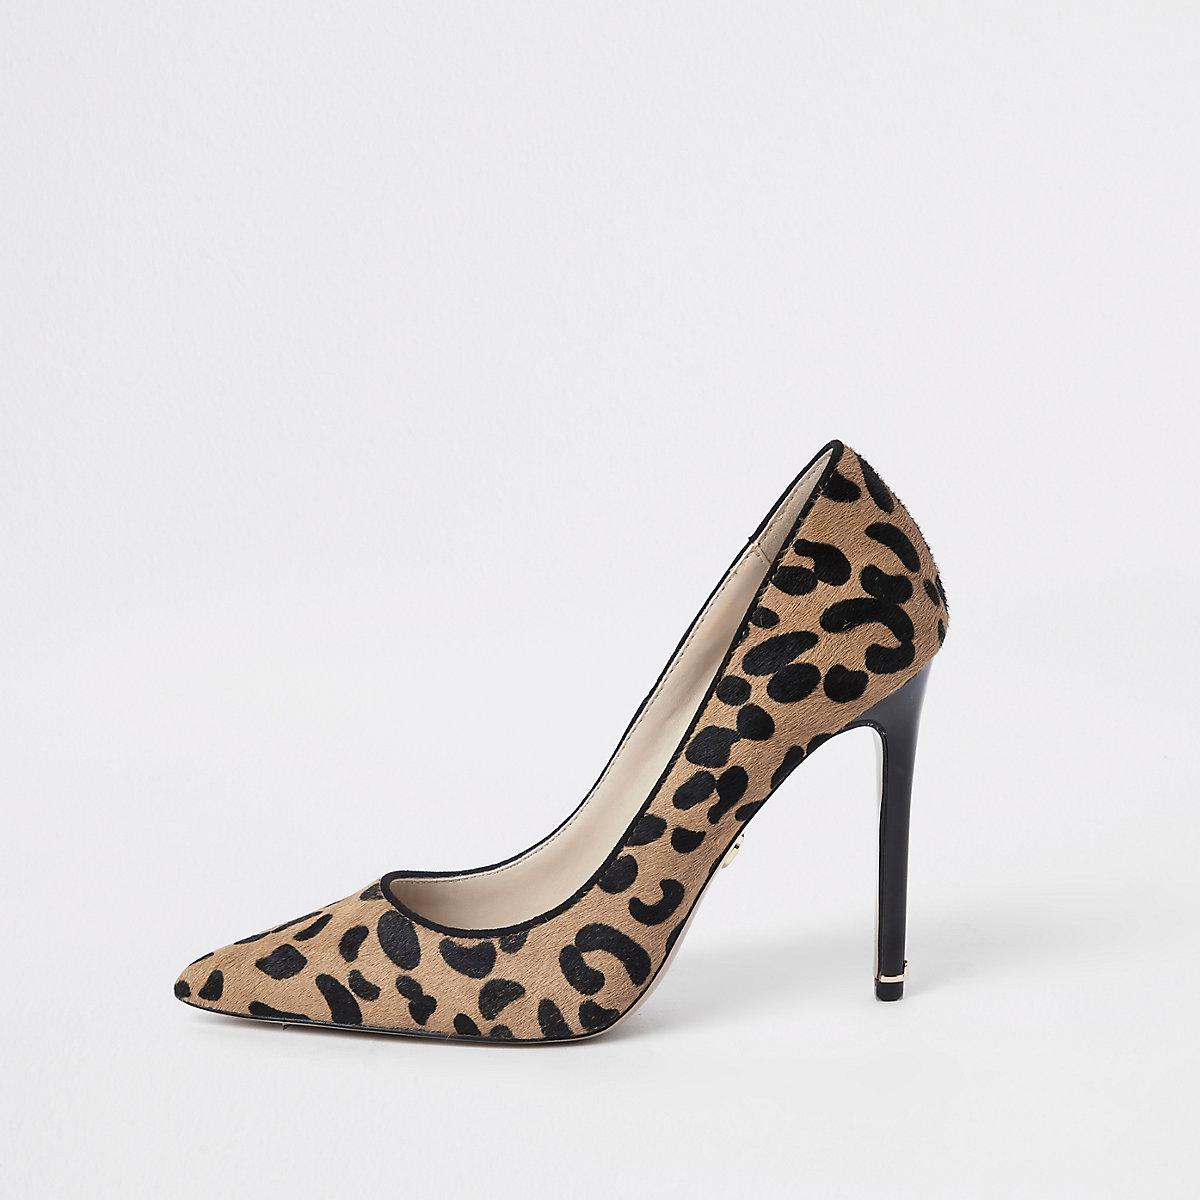 Brown leather leopard print pumps